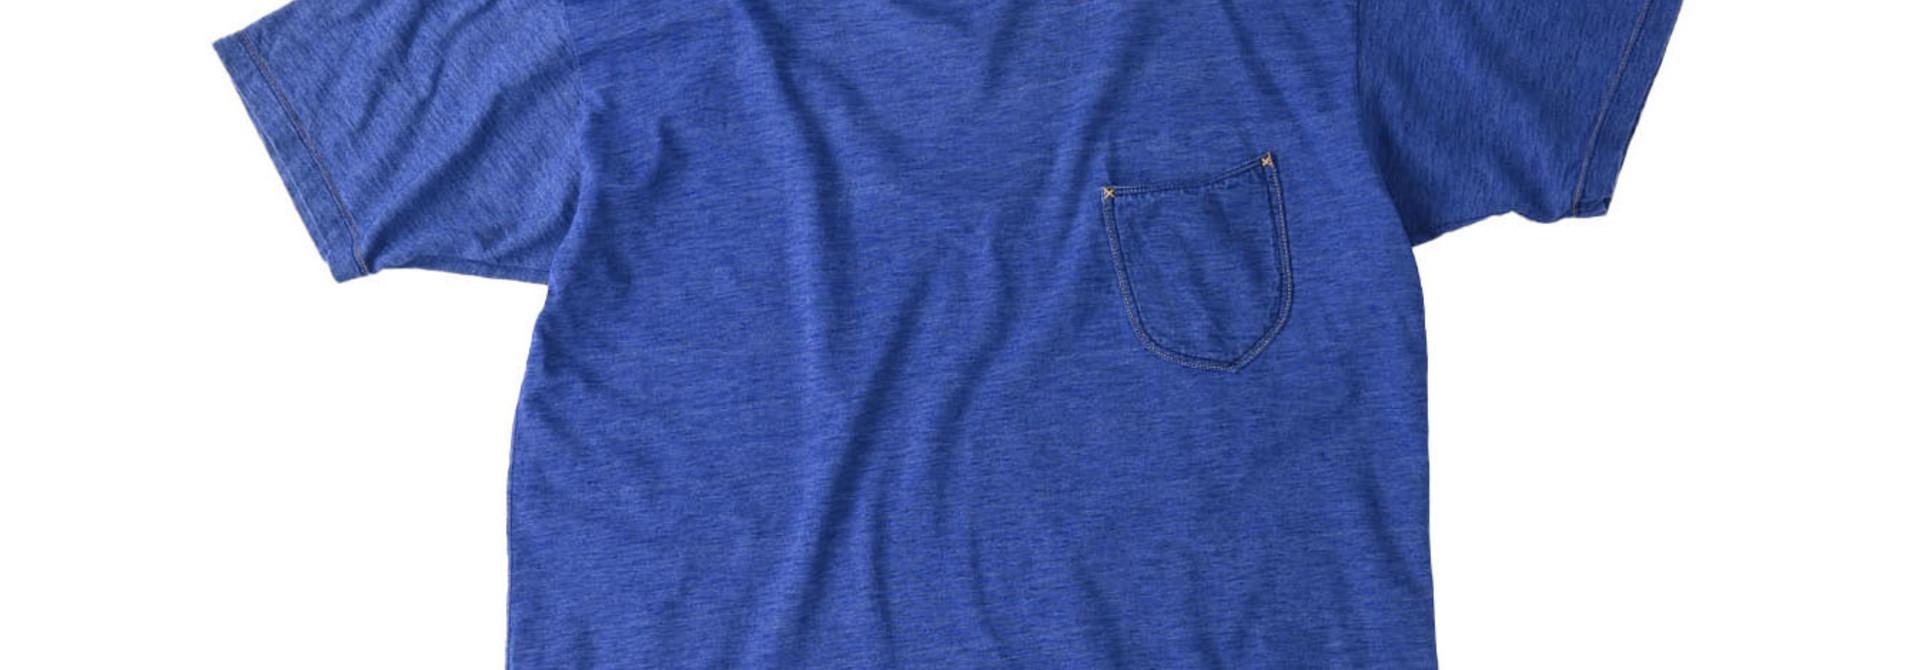 Distressed Indigo Tenjiku 908 Ocean T-Shirt (0621)